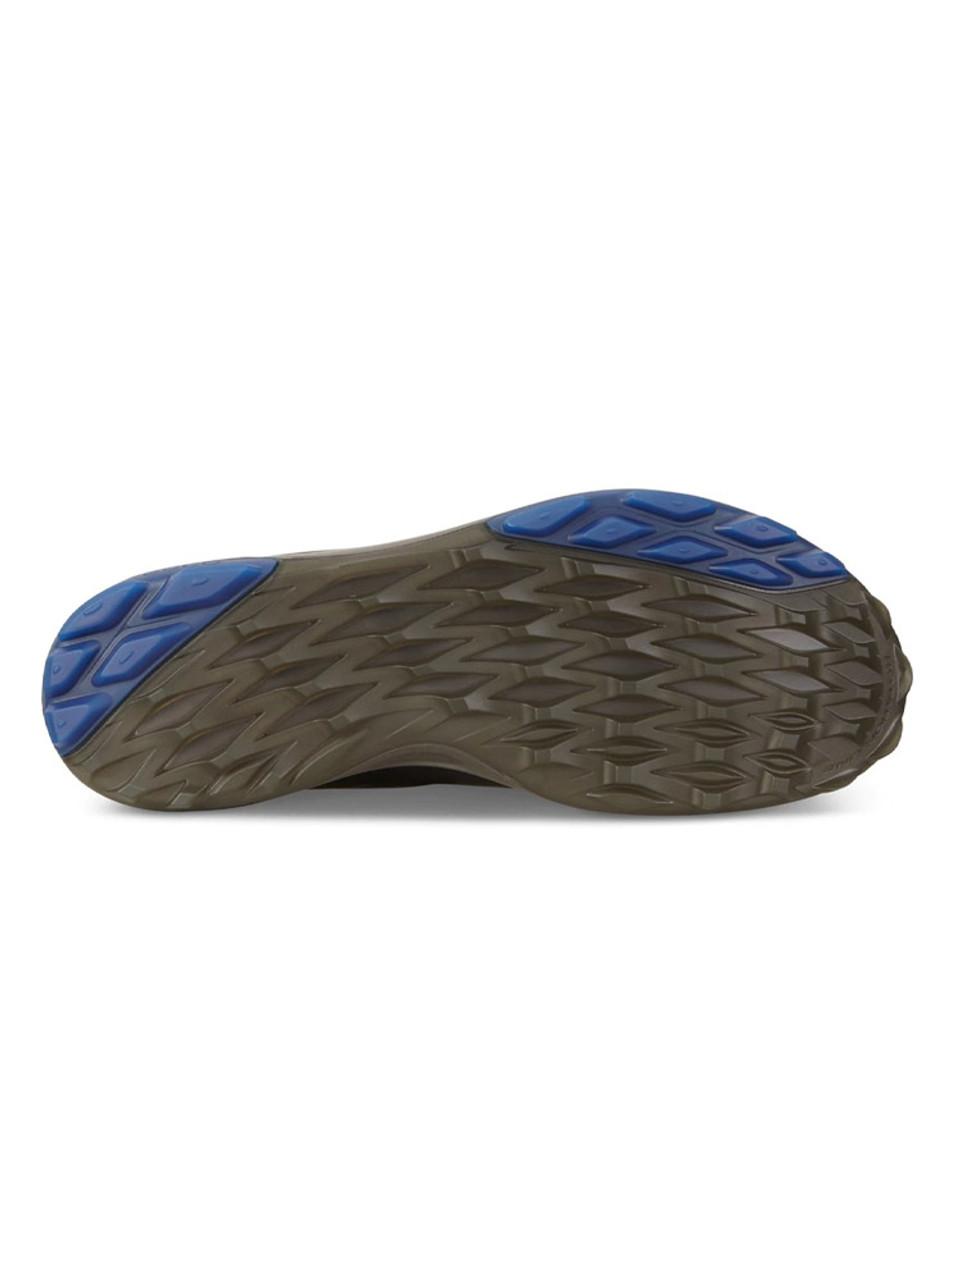 Ecco Biom Hybrid 3 Golf Shoes - Black